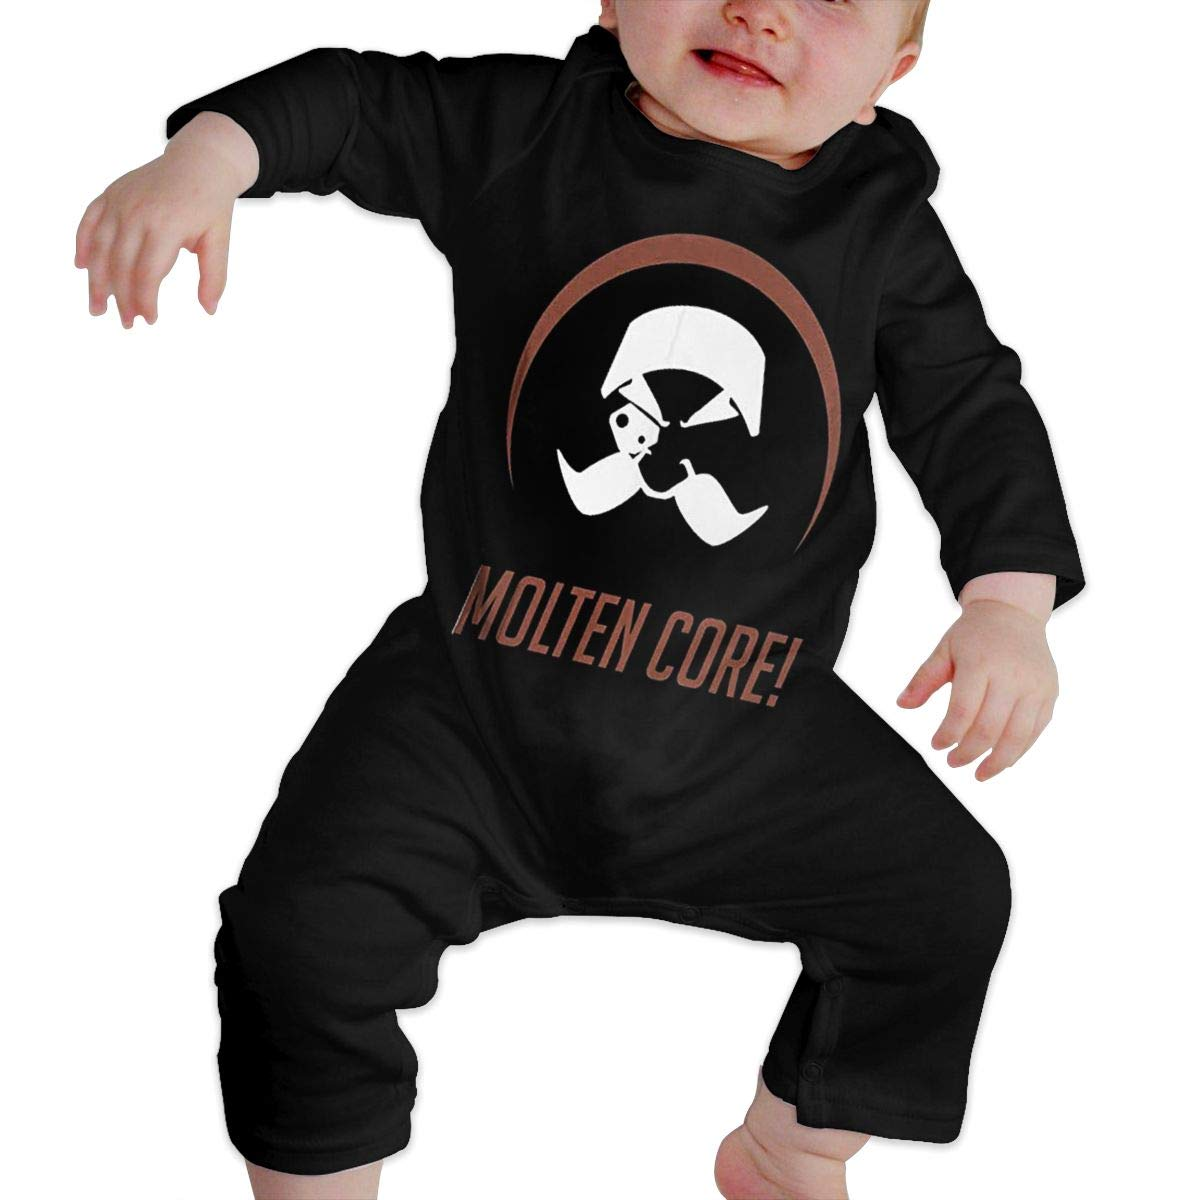 Kids Baby Long Sleeve Romper Overwatch-Torbjorn Unisex Cotton Cute Jumpsuit Baby Crawler Clothes